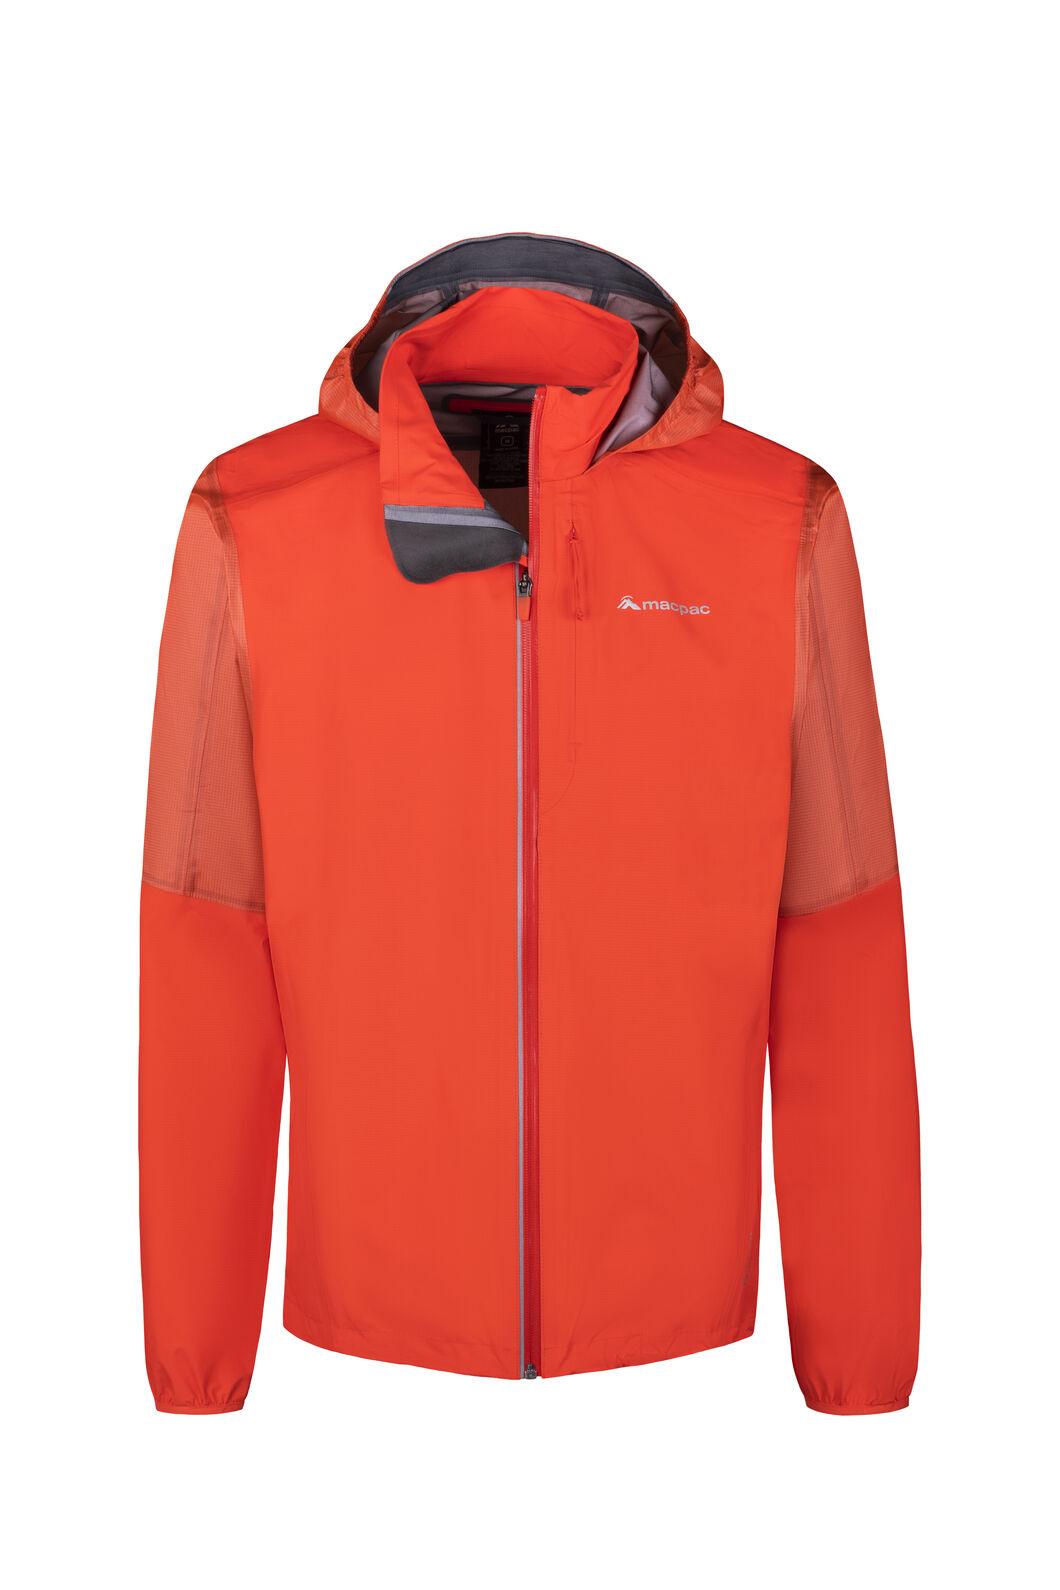 Macpac Transition Pertex® Rain Jacket - Men's, Mandarin Red, hi-res